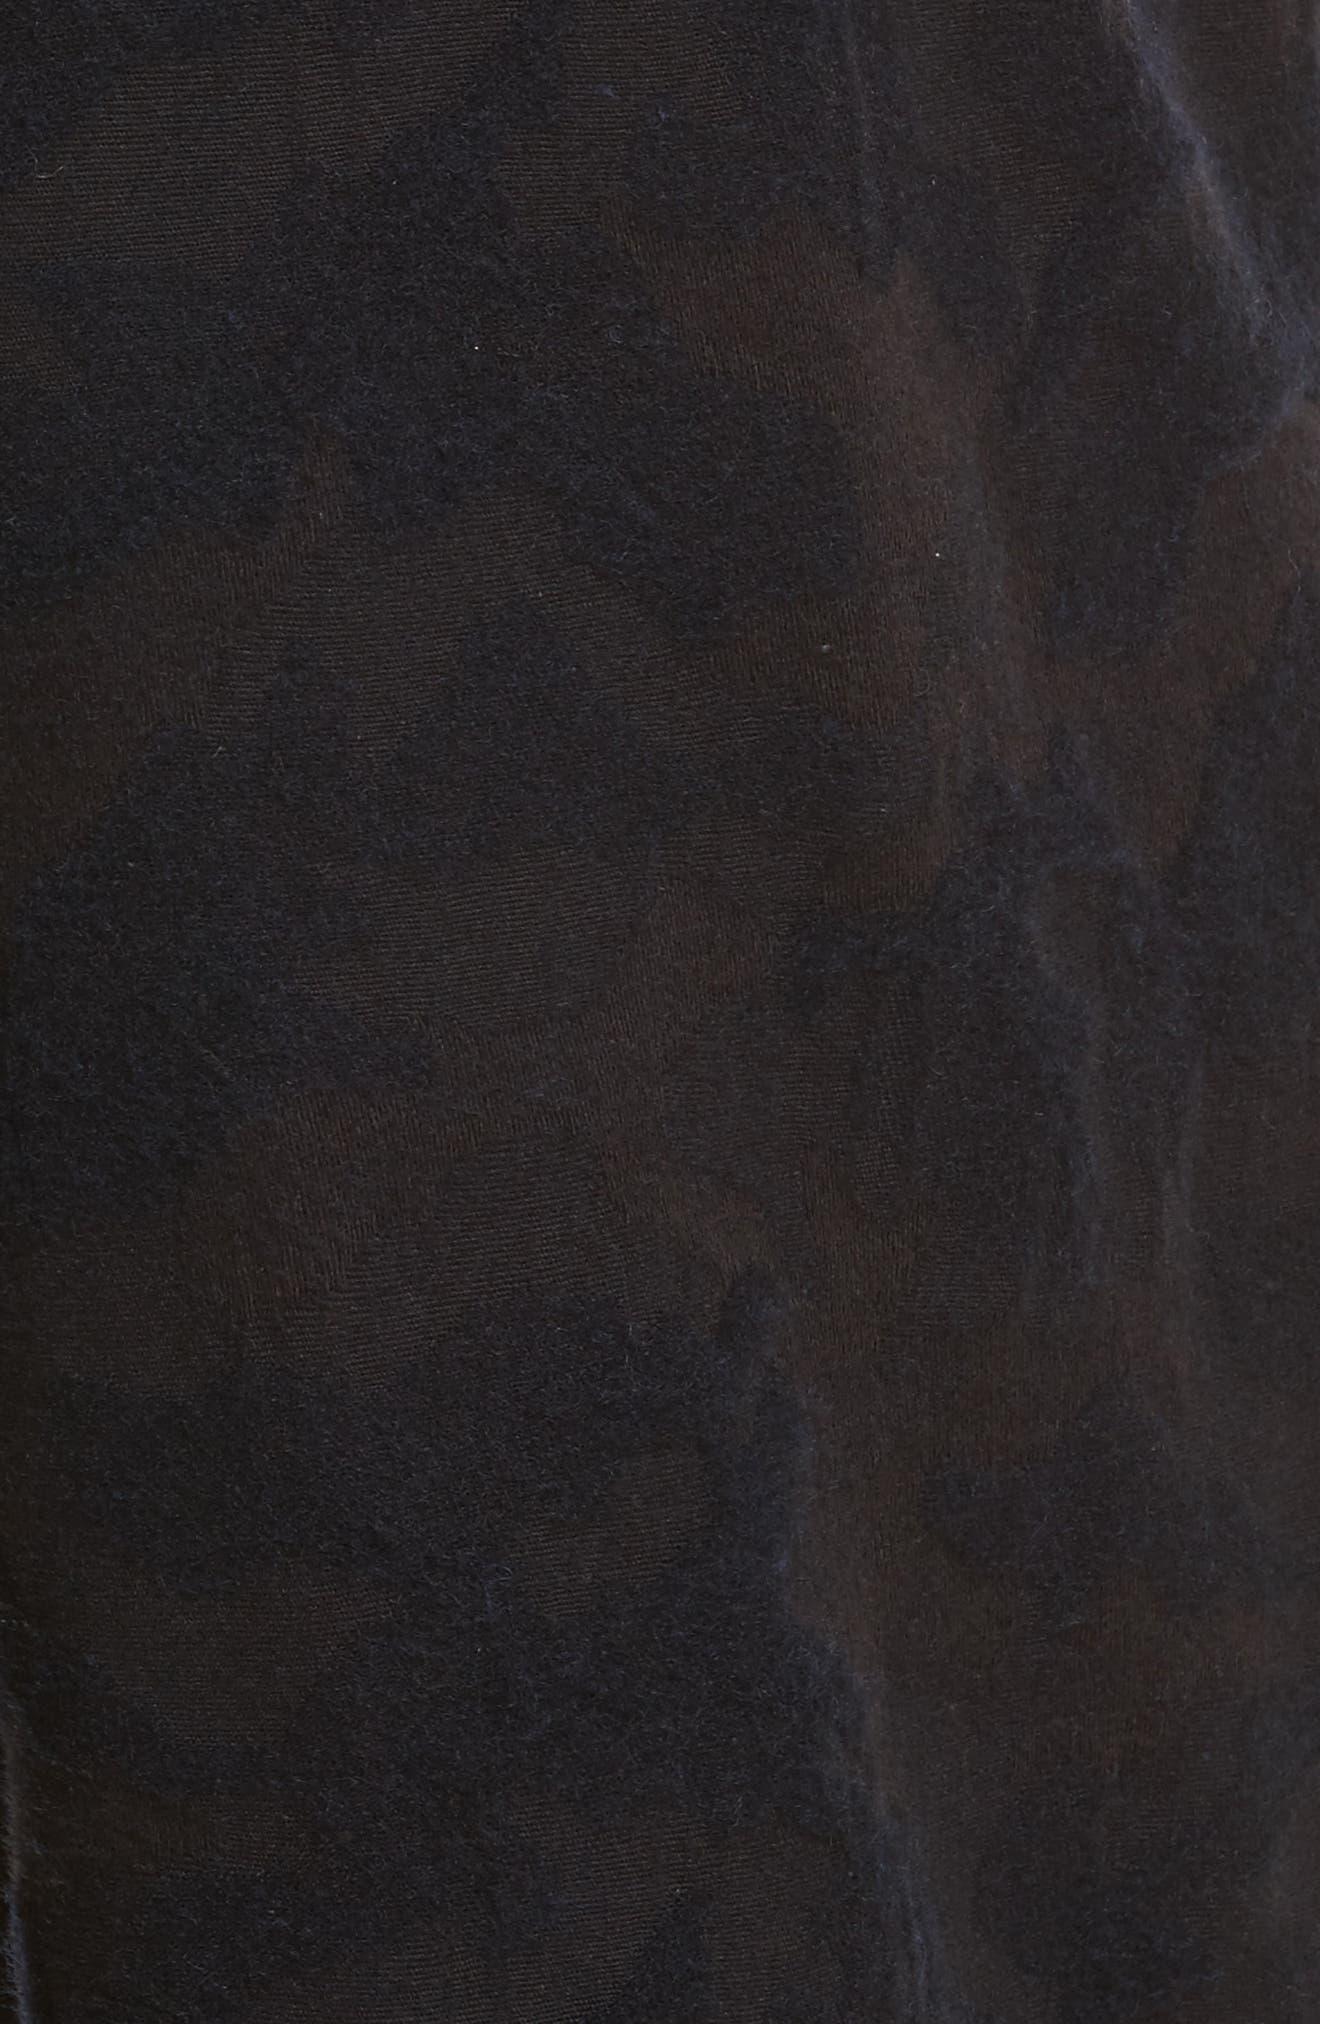 Camo Crop Pants,                             Alternate thumbnail 5, color,                             Navy